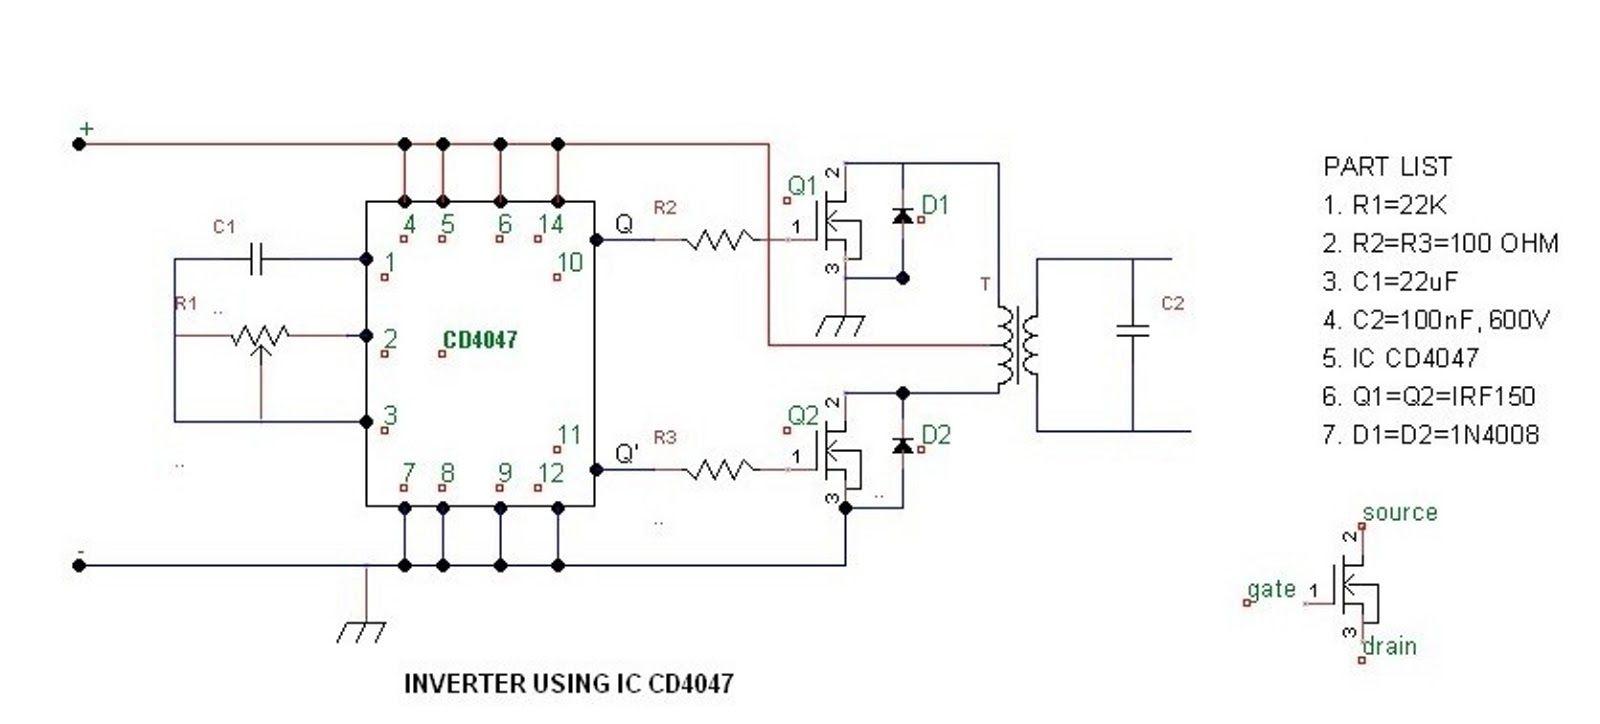 The purpose to build a simple 100 watt to 500 watt inverter circuit ...